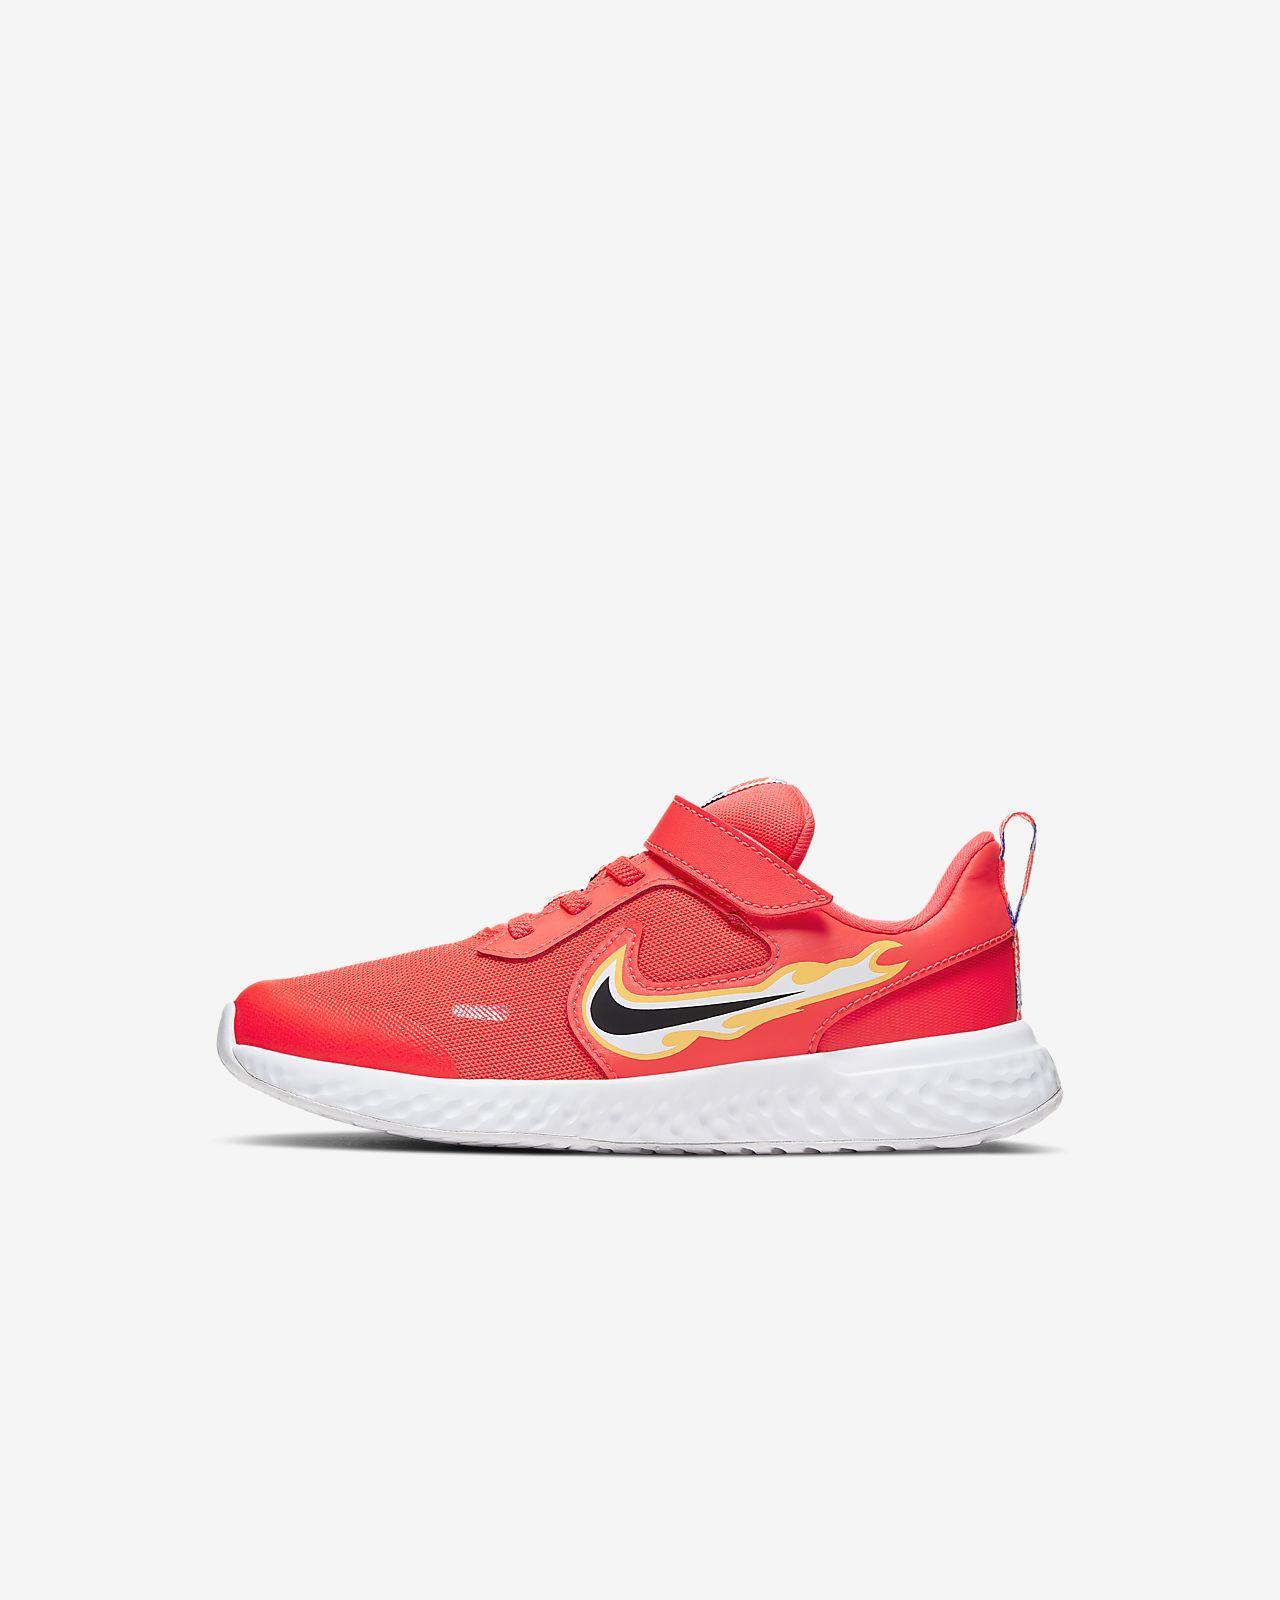 Scarpa Nike Revolution 5 Fire - Bambini